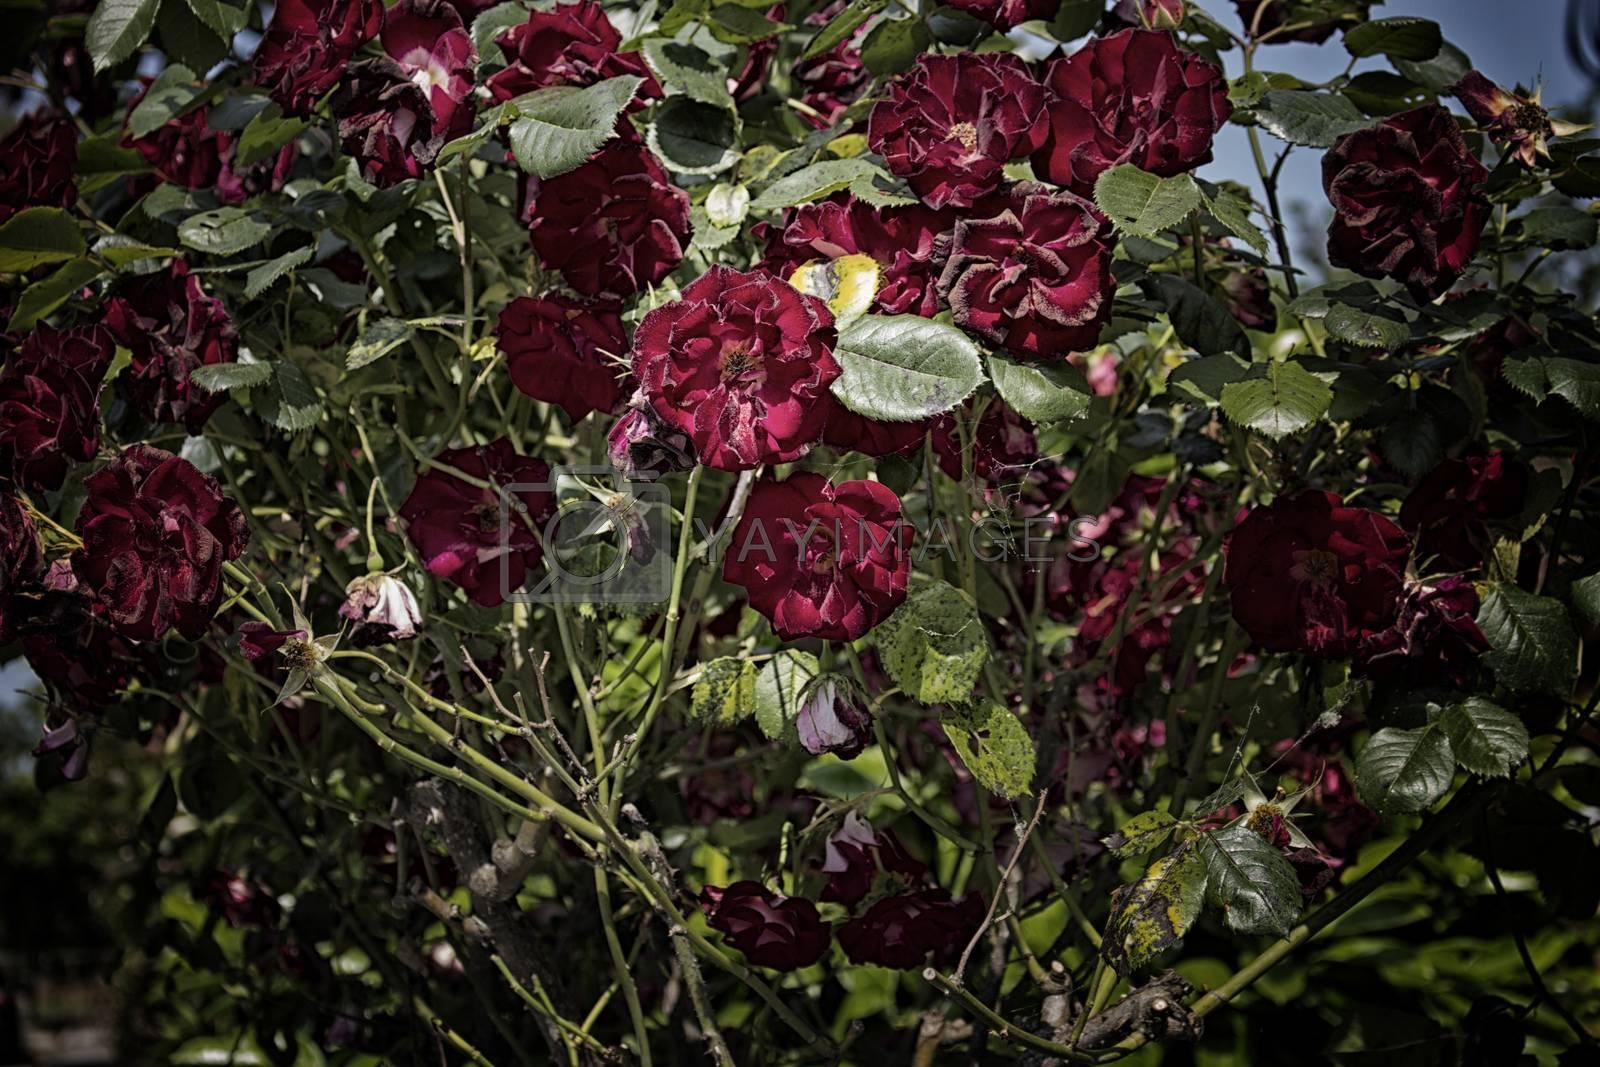 Red roses in Italian garden